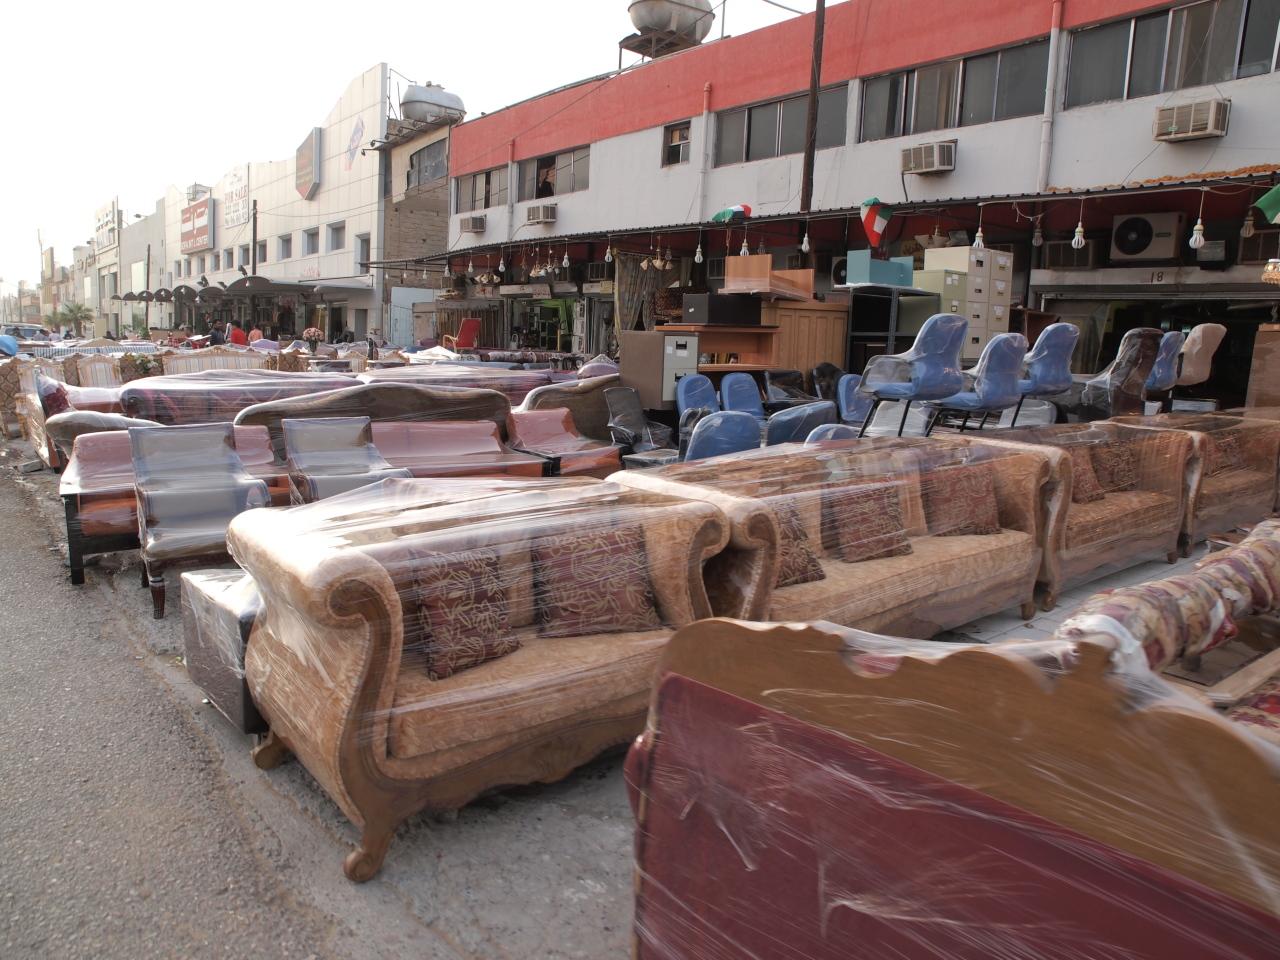 Jual Sofa Bed Murah Di Jakarta Selatan Best Affordable Sleeper Sofas Second Stkittsvilla